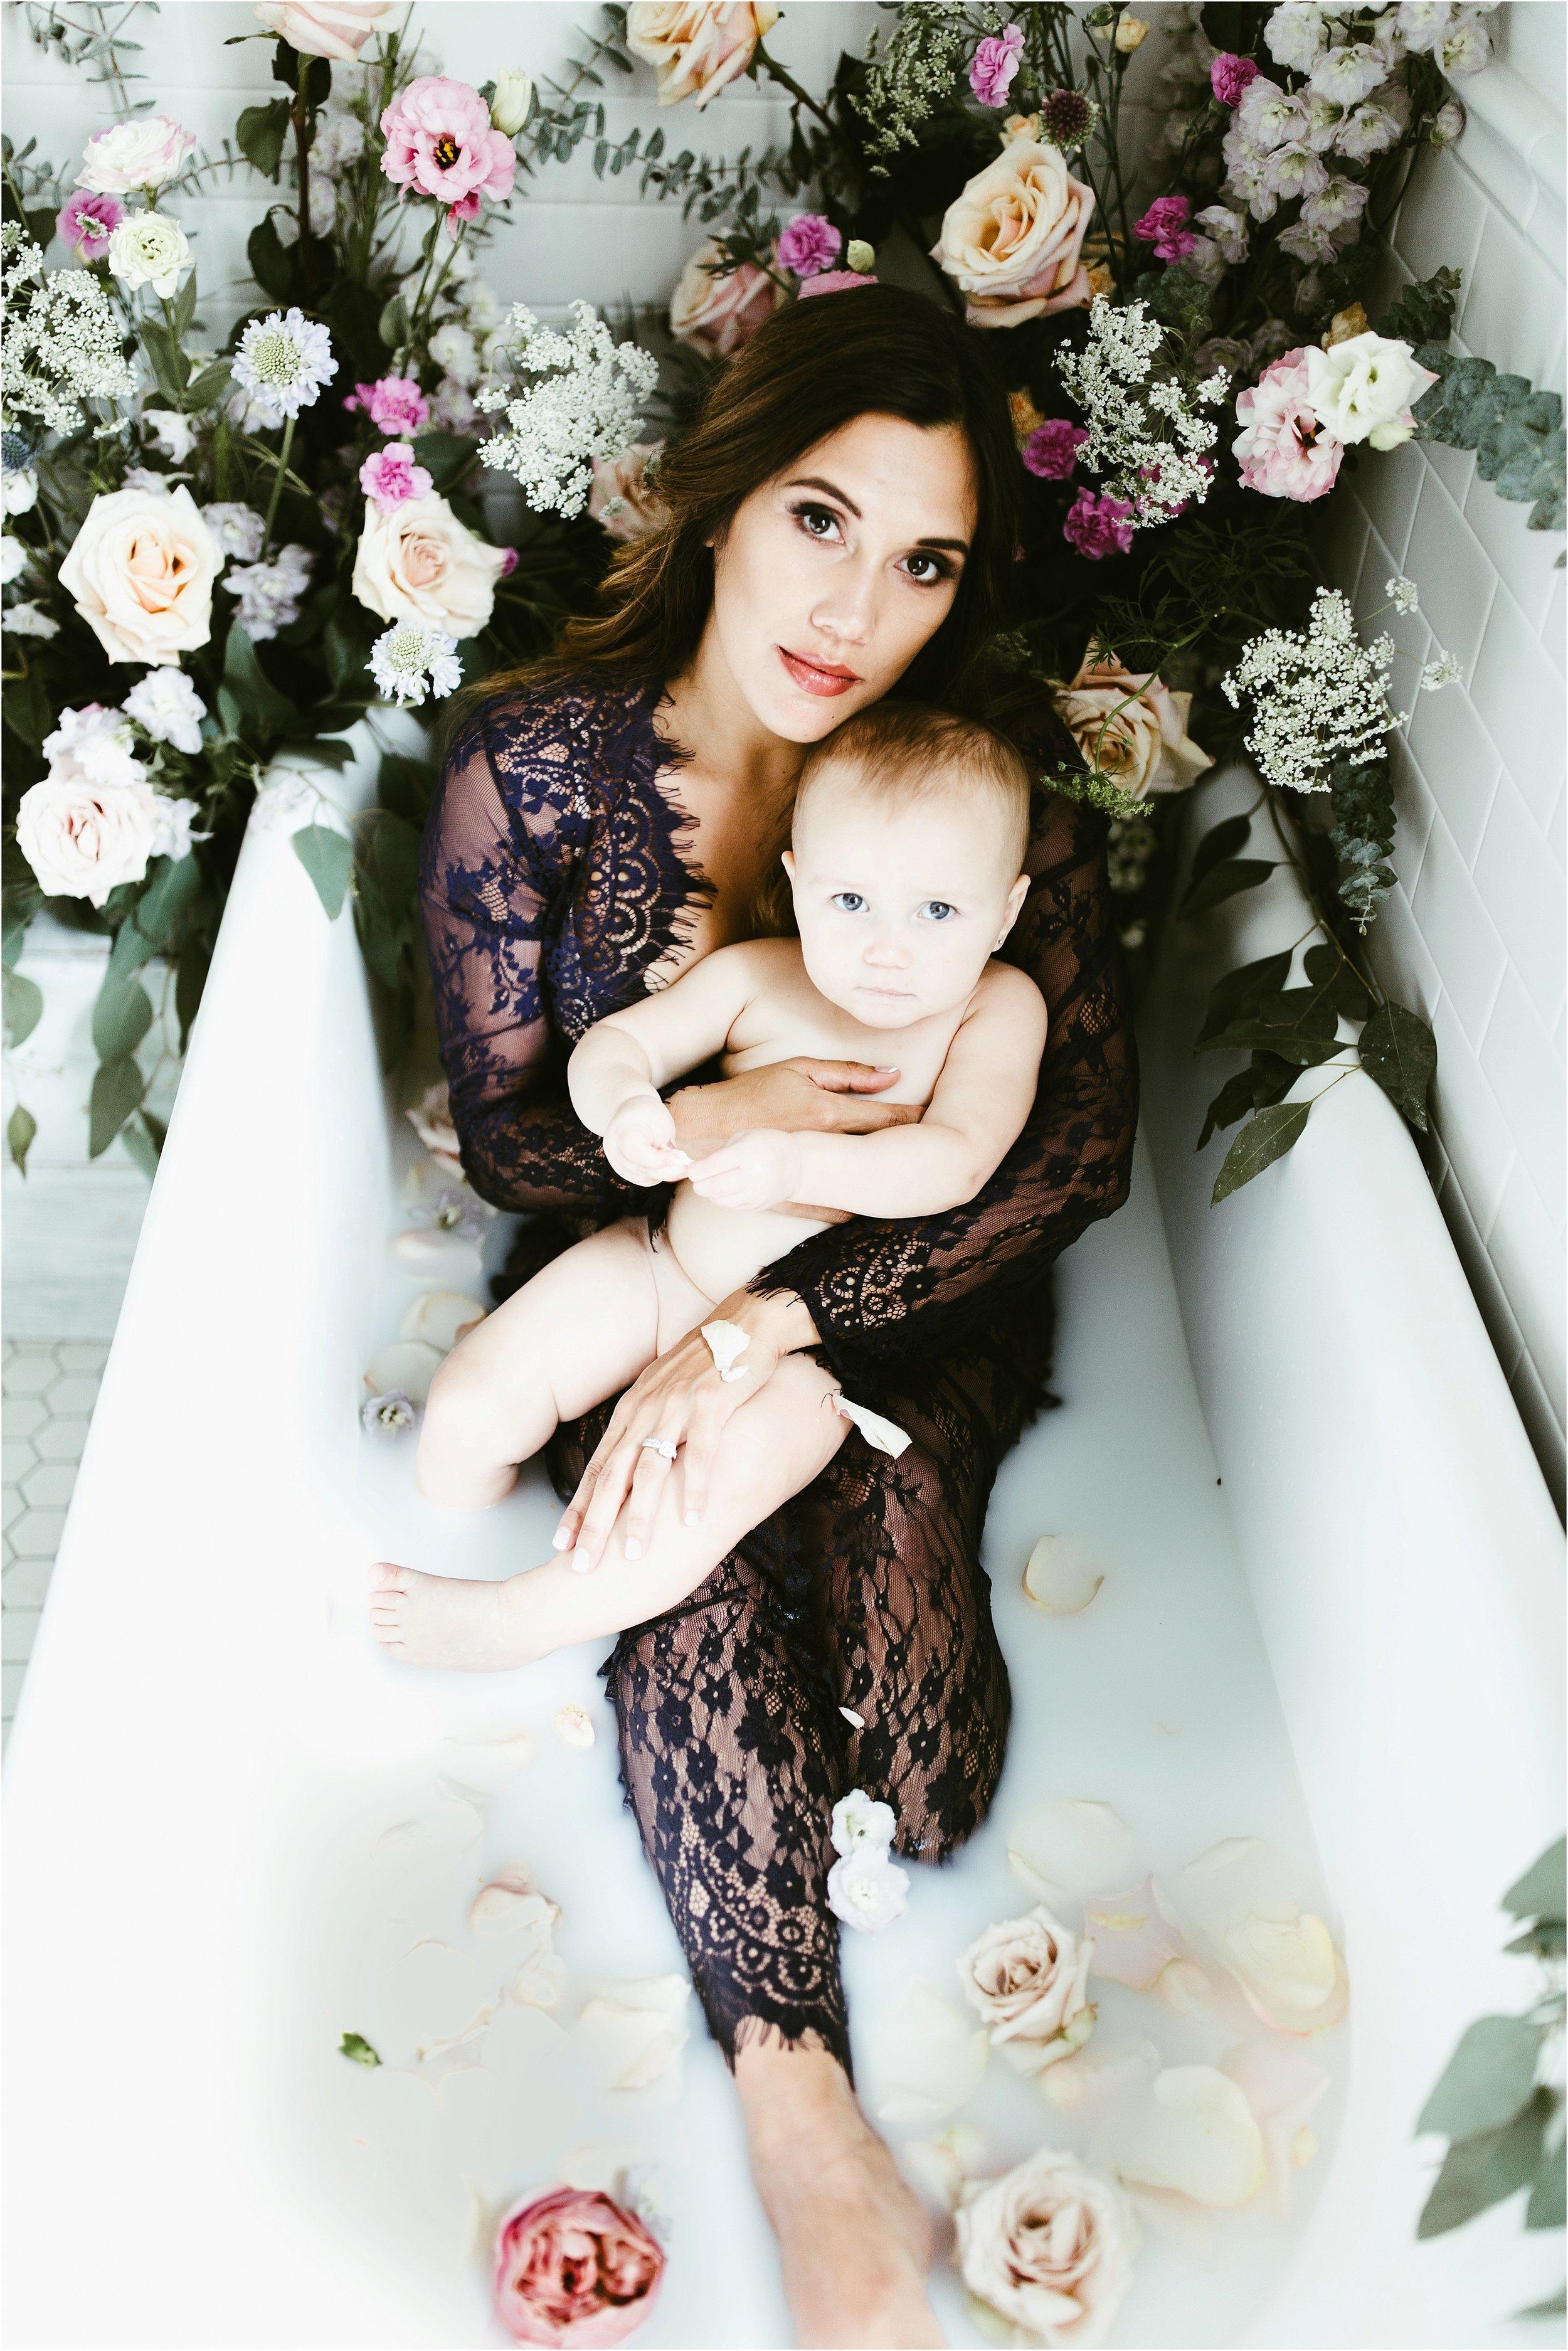 Quaint-and-Whim-Louisiana-Milk-Bath-Photography-Maternity-003.JPG